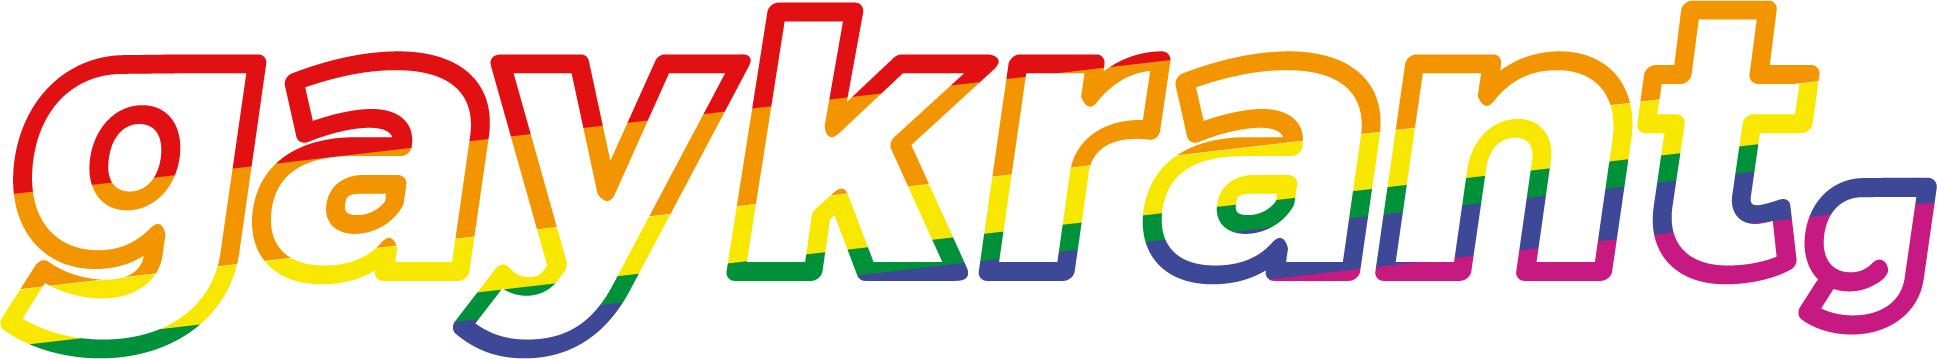 gaykrant,